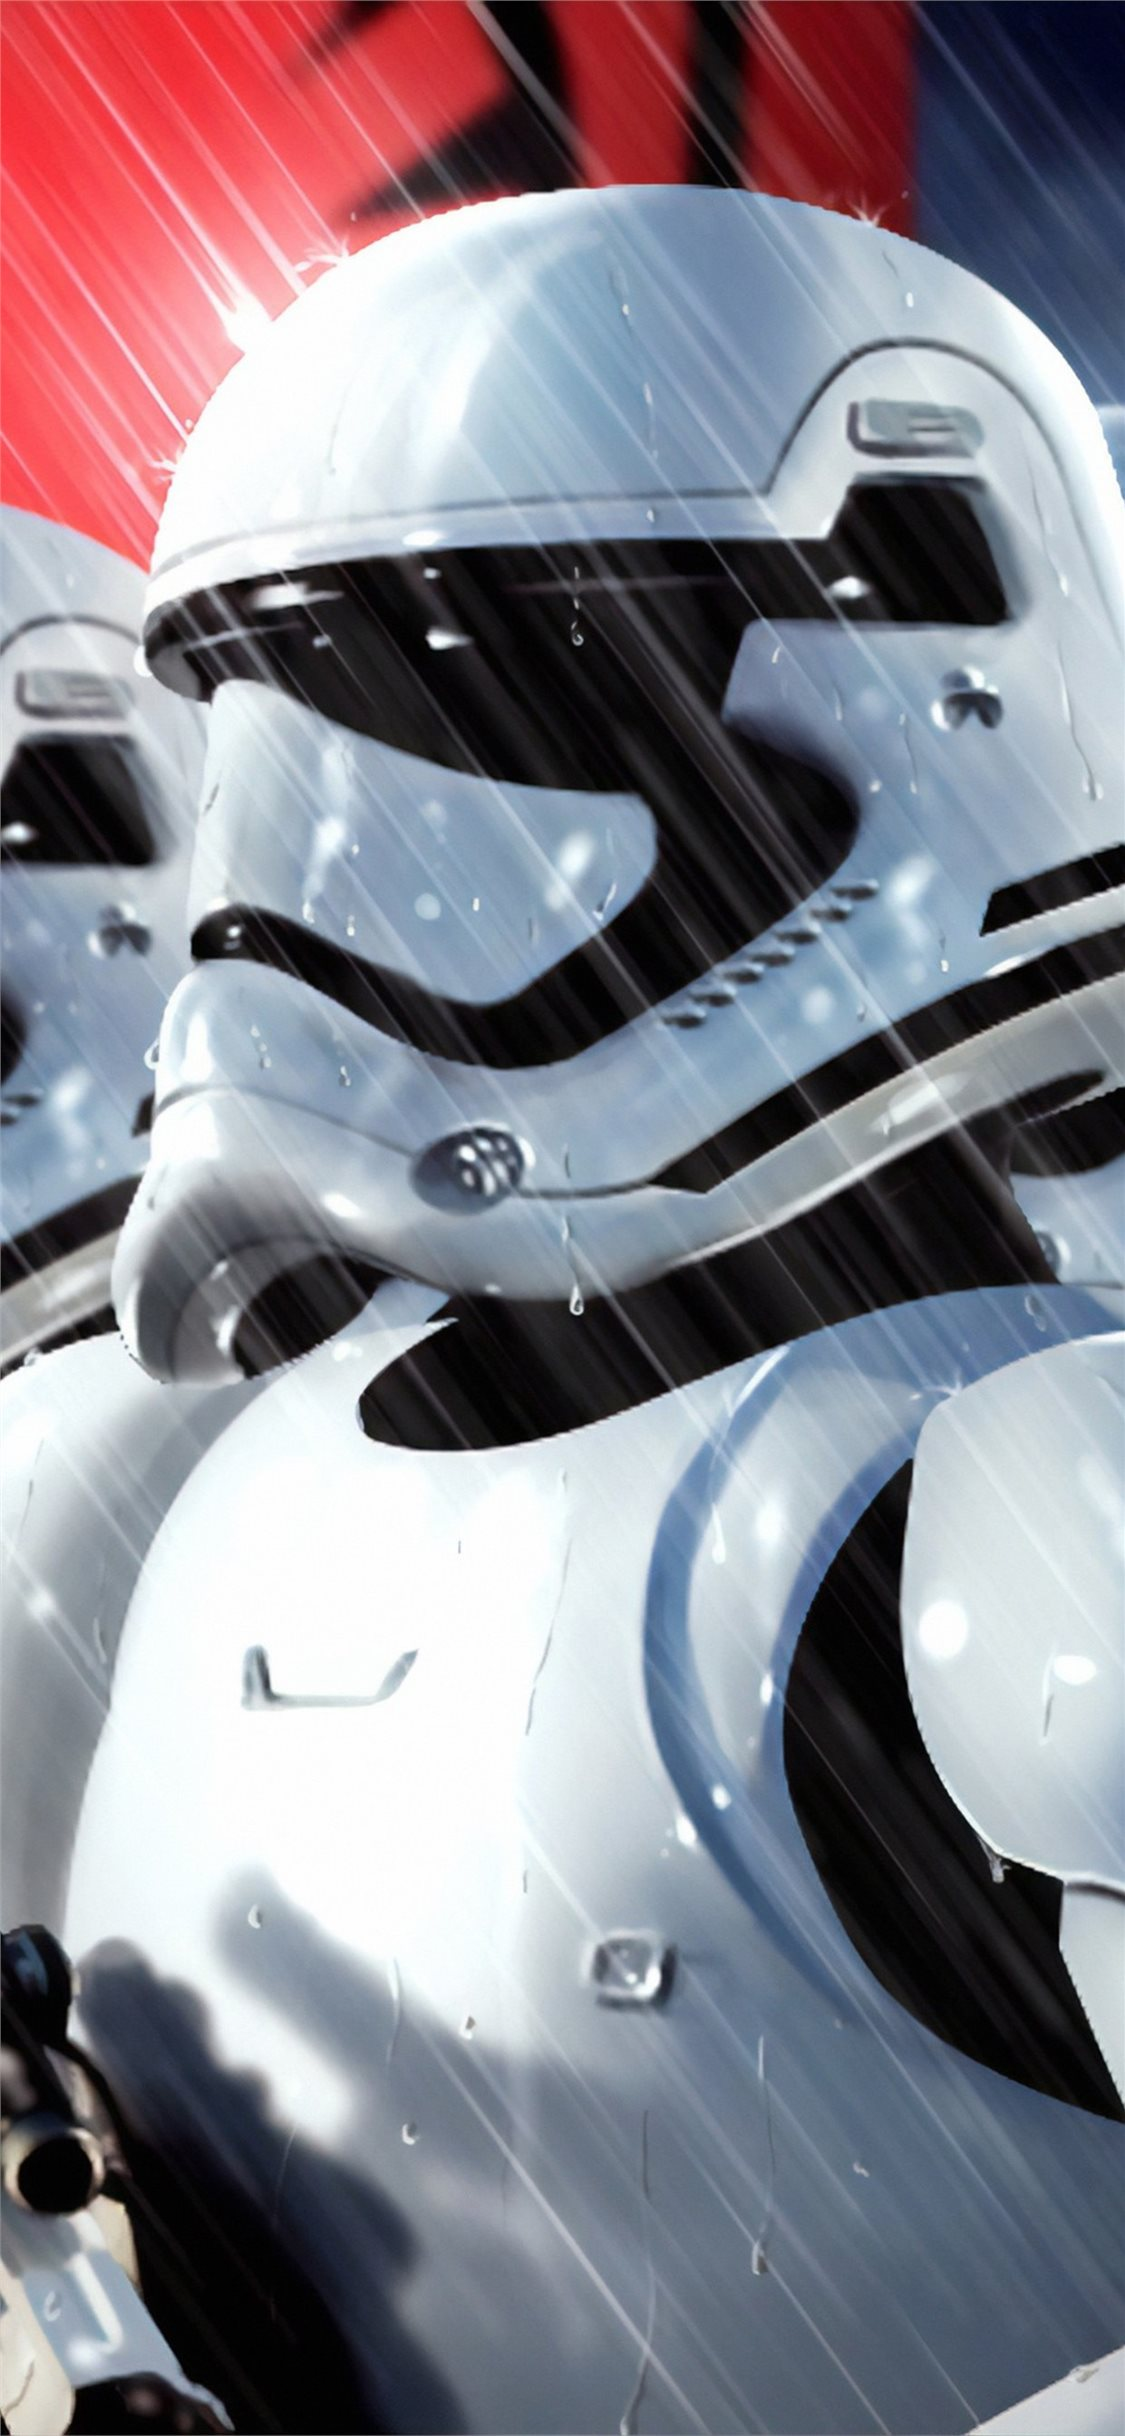 Stormtroopers 4k Art Iphone X Wallpapers Free Download